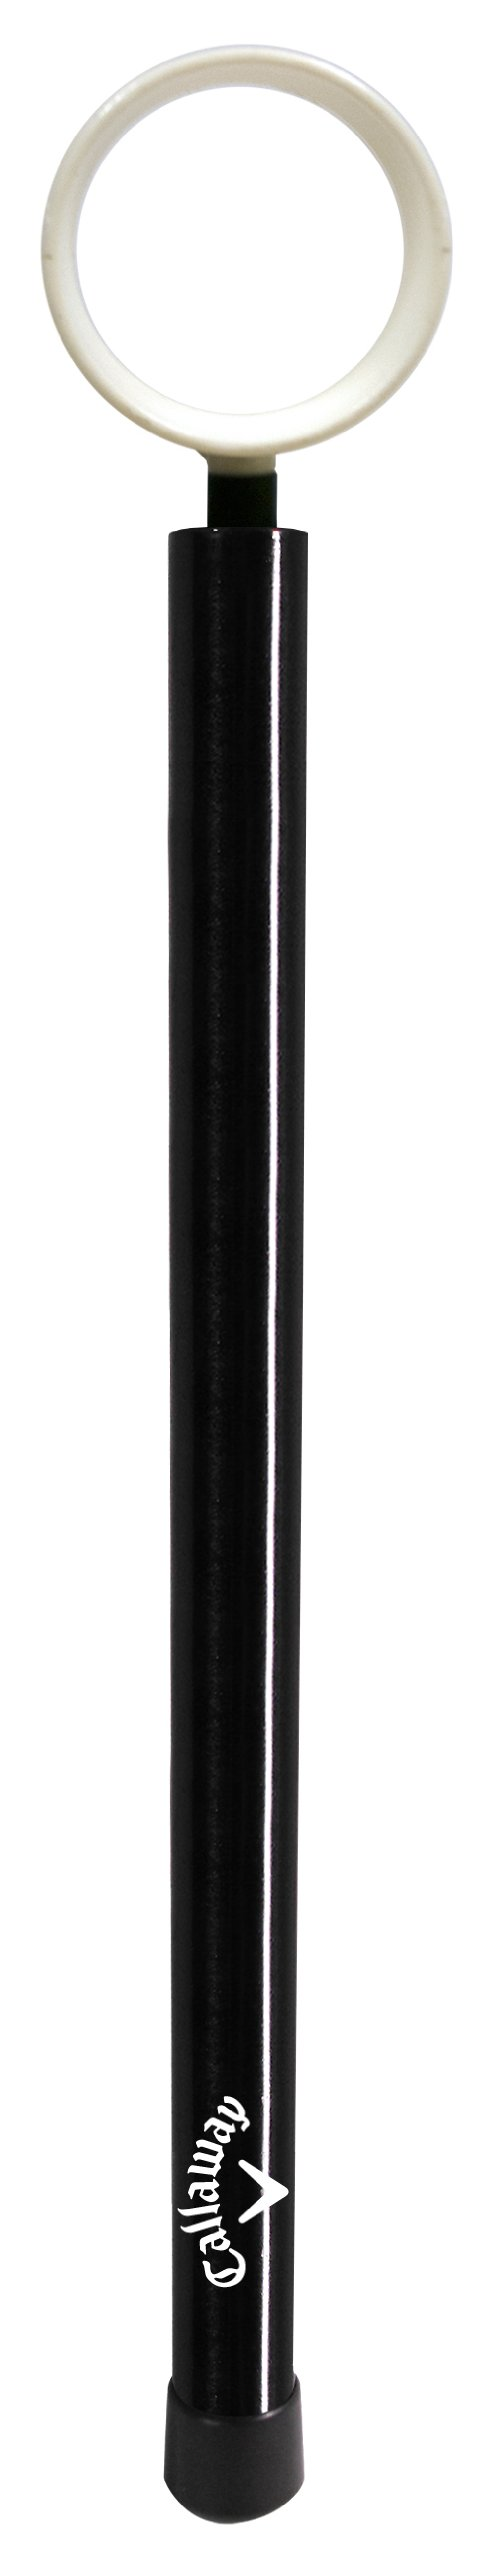 Callaway Ultra-Lite Pocket Ball Retriever